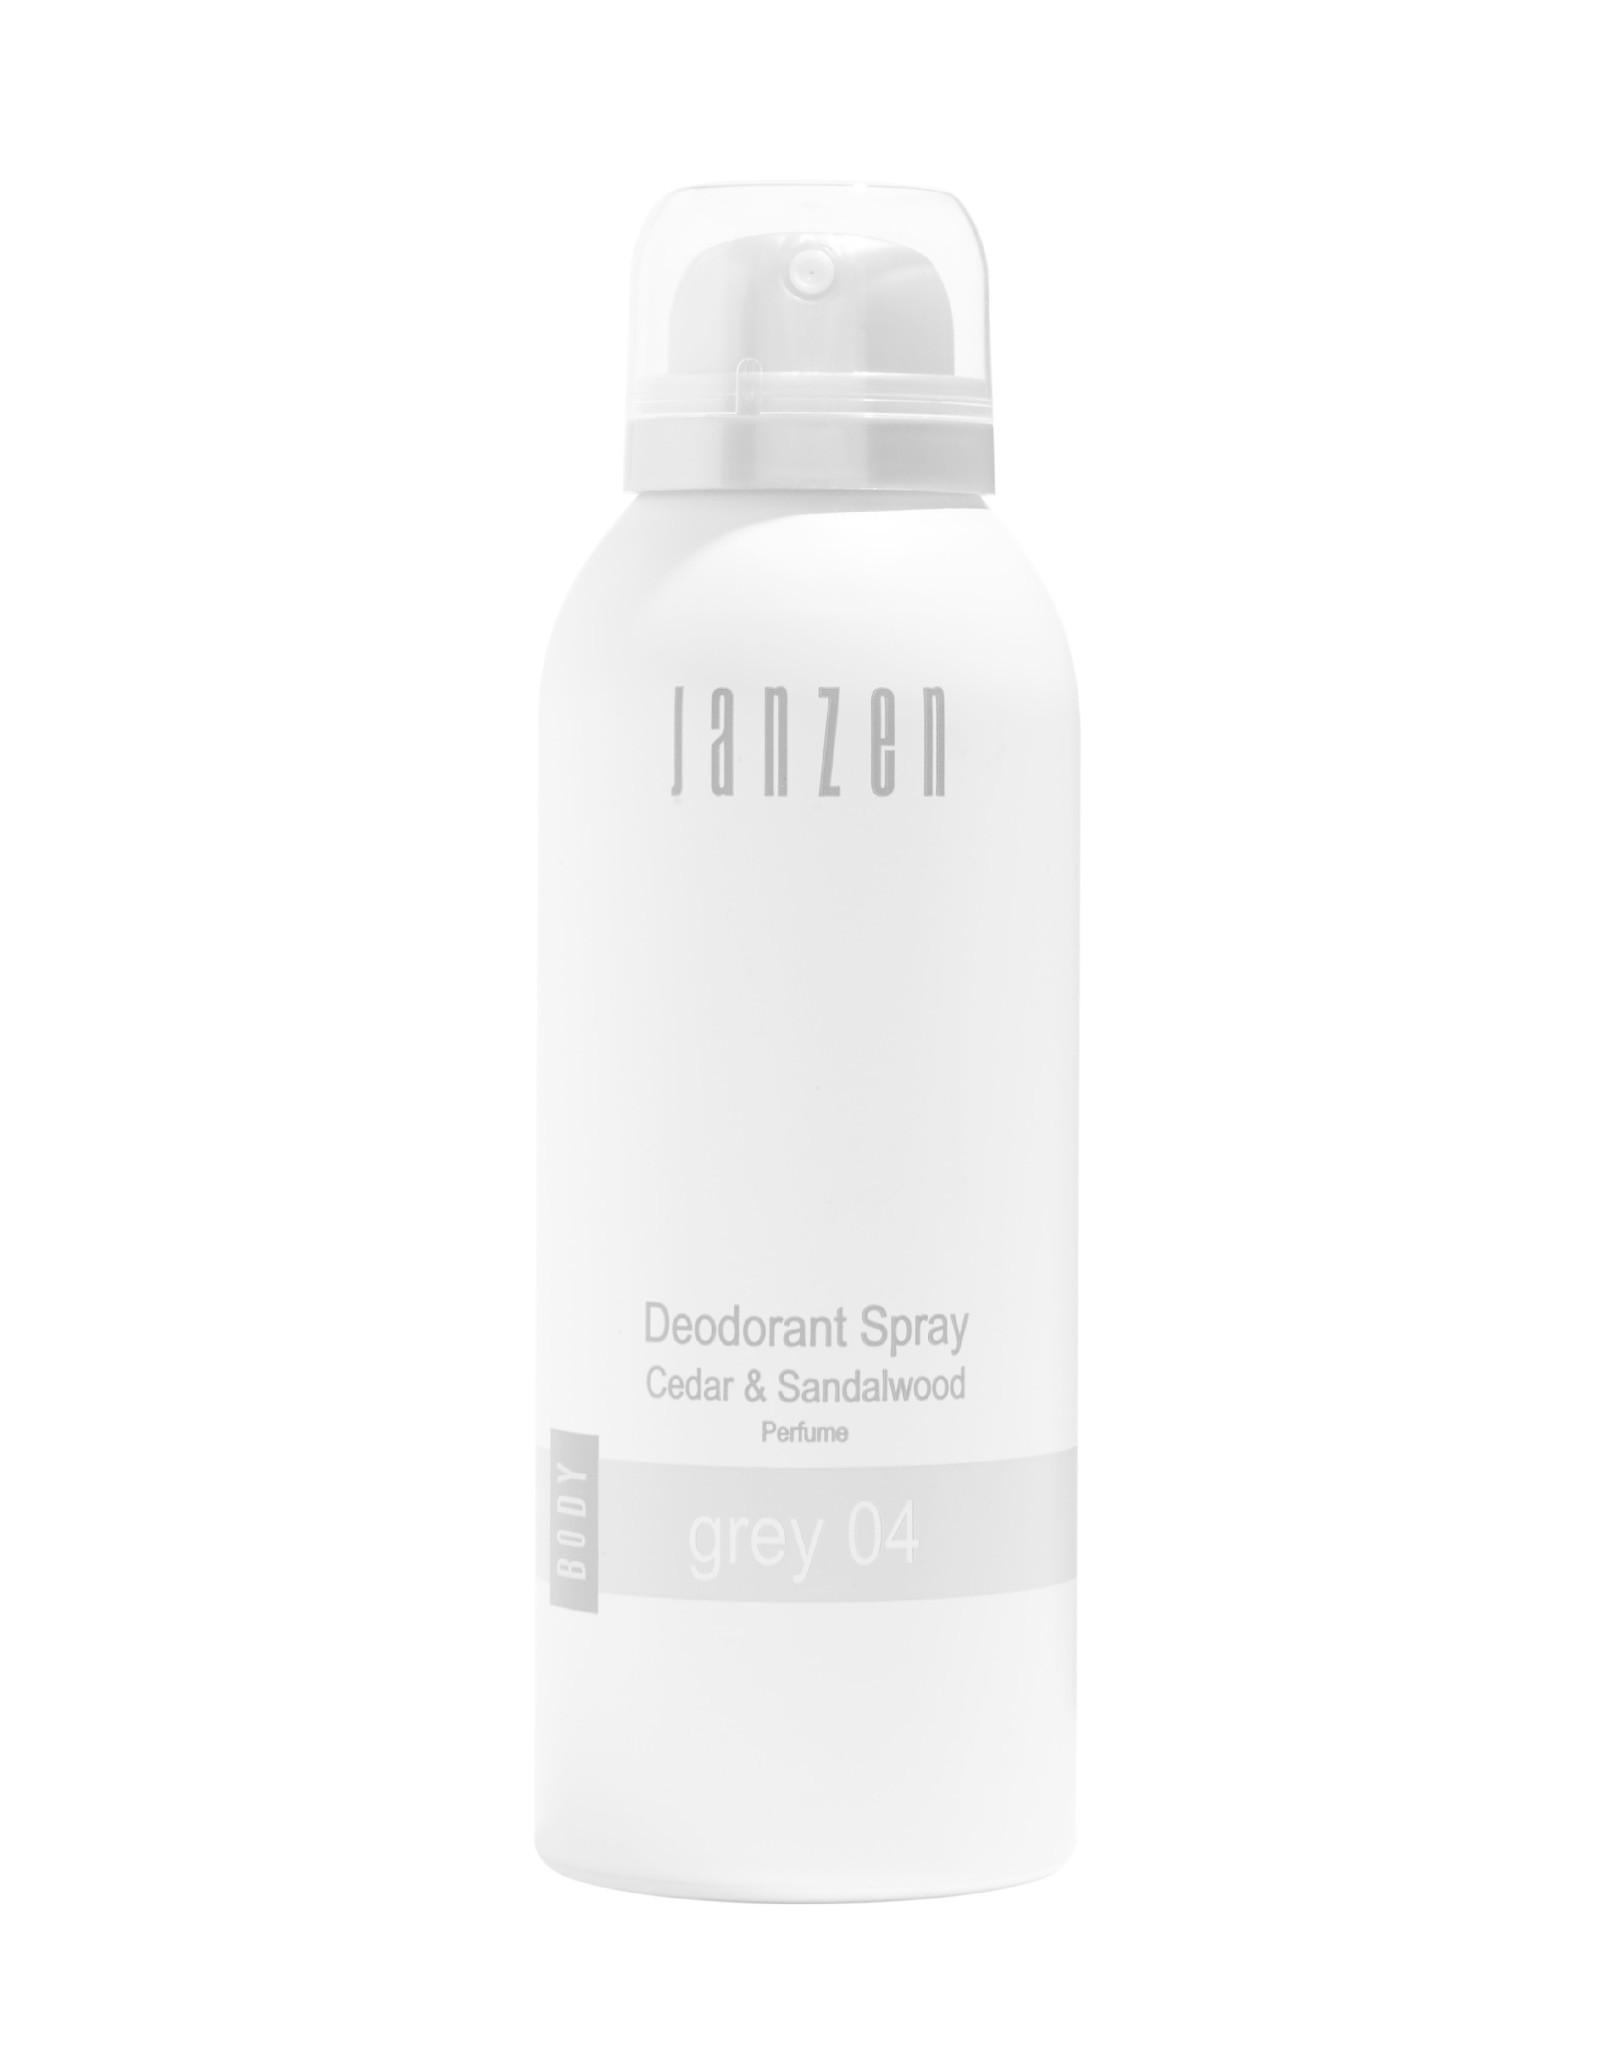 JANZEN Deodorant Spray Grey 04 150ml - JANZEN